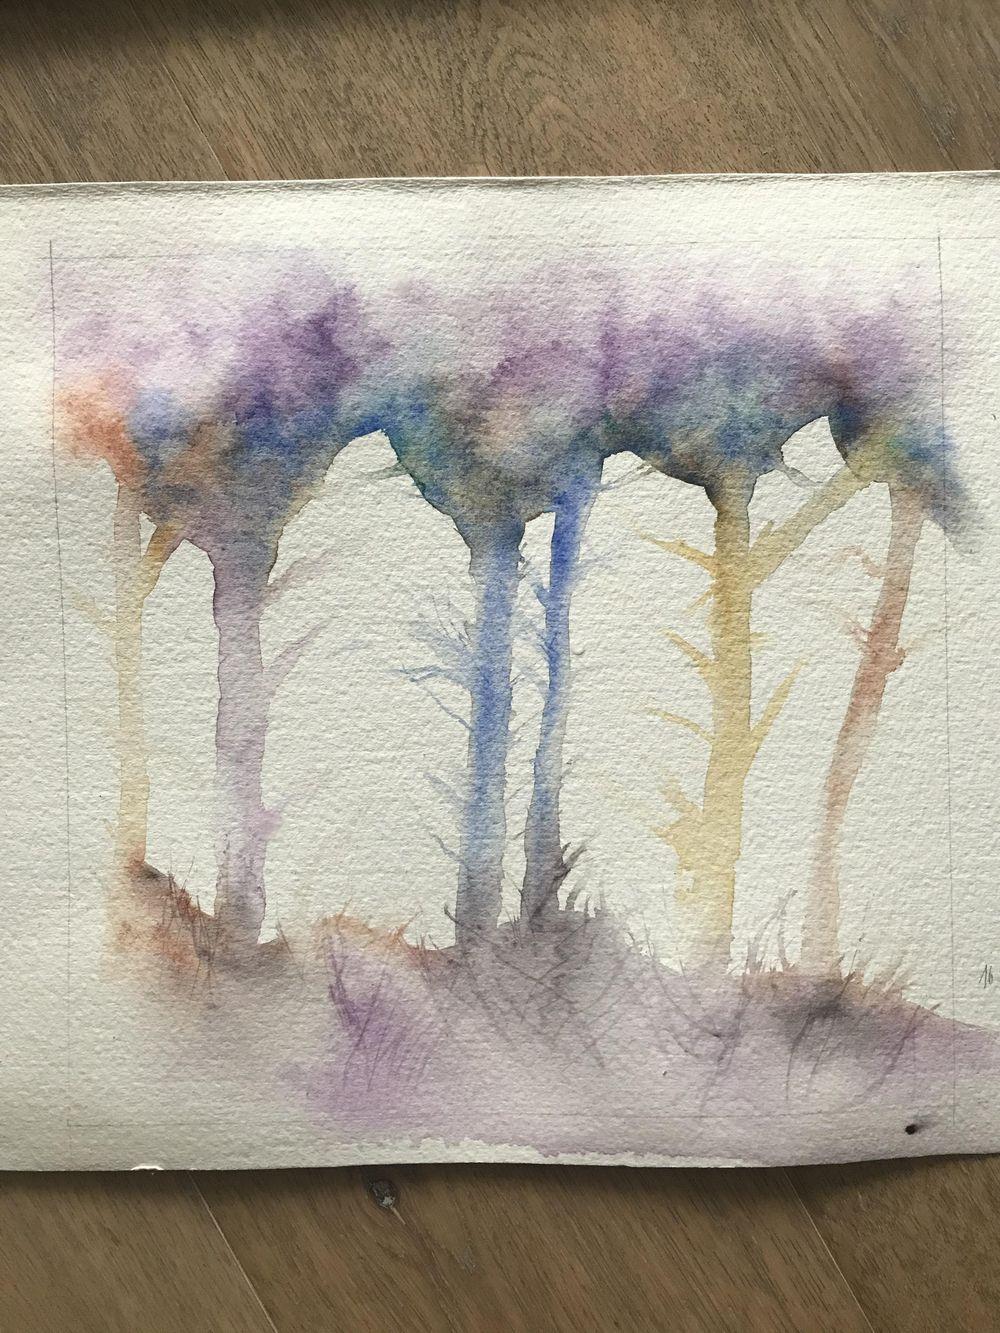 My rainbow trees - image 1 - student project